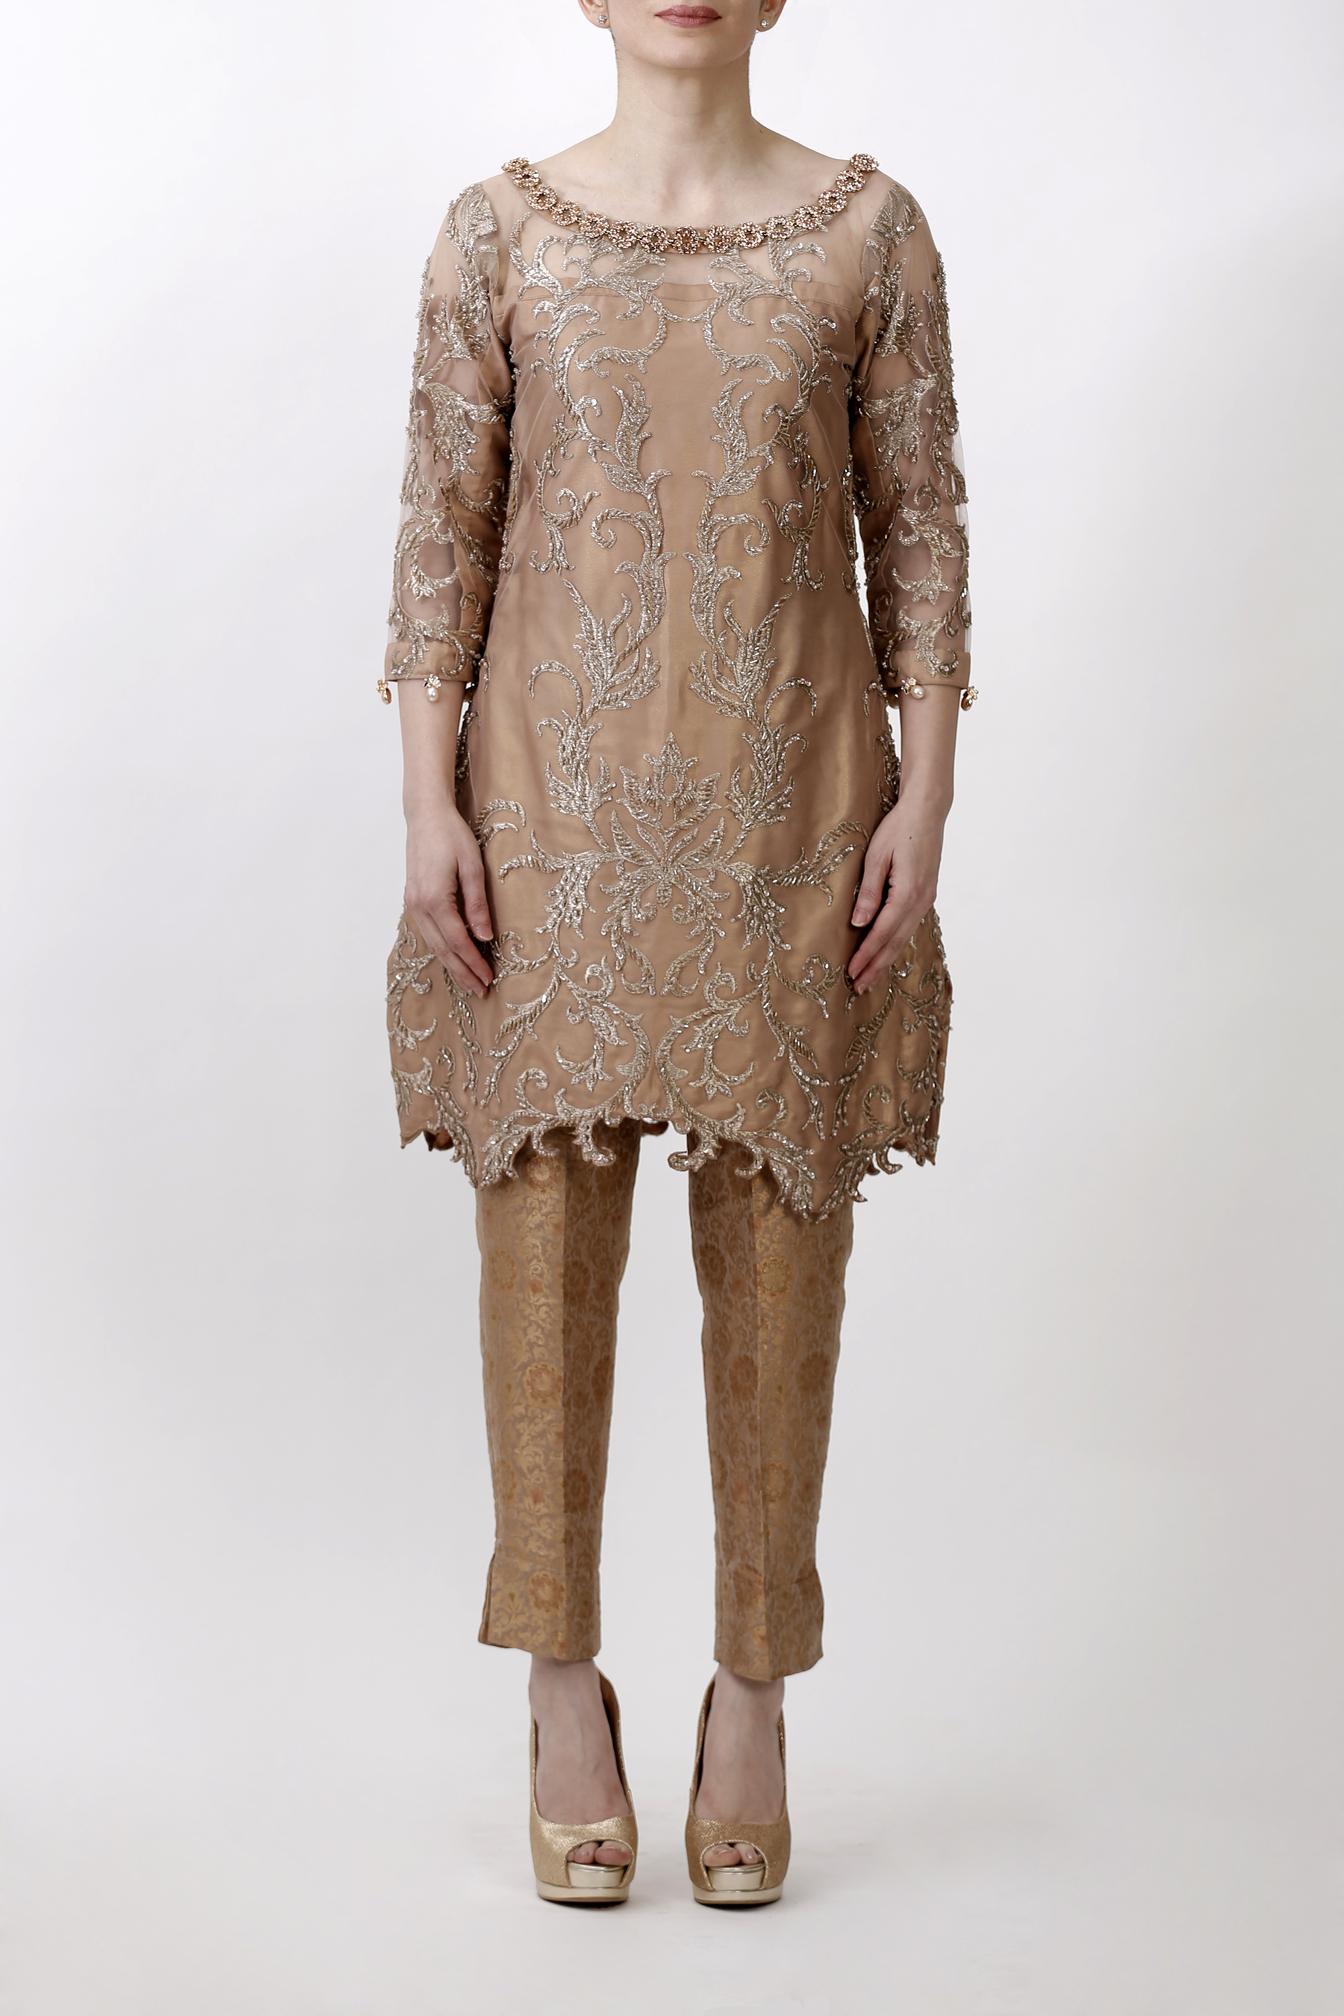 101 elegant bronze 1344x2016